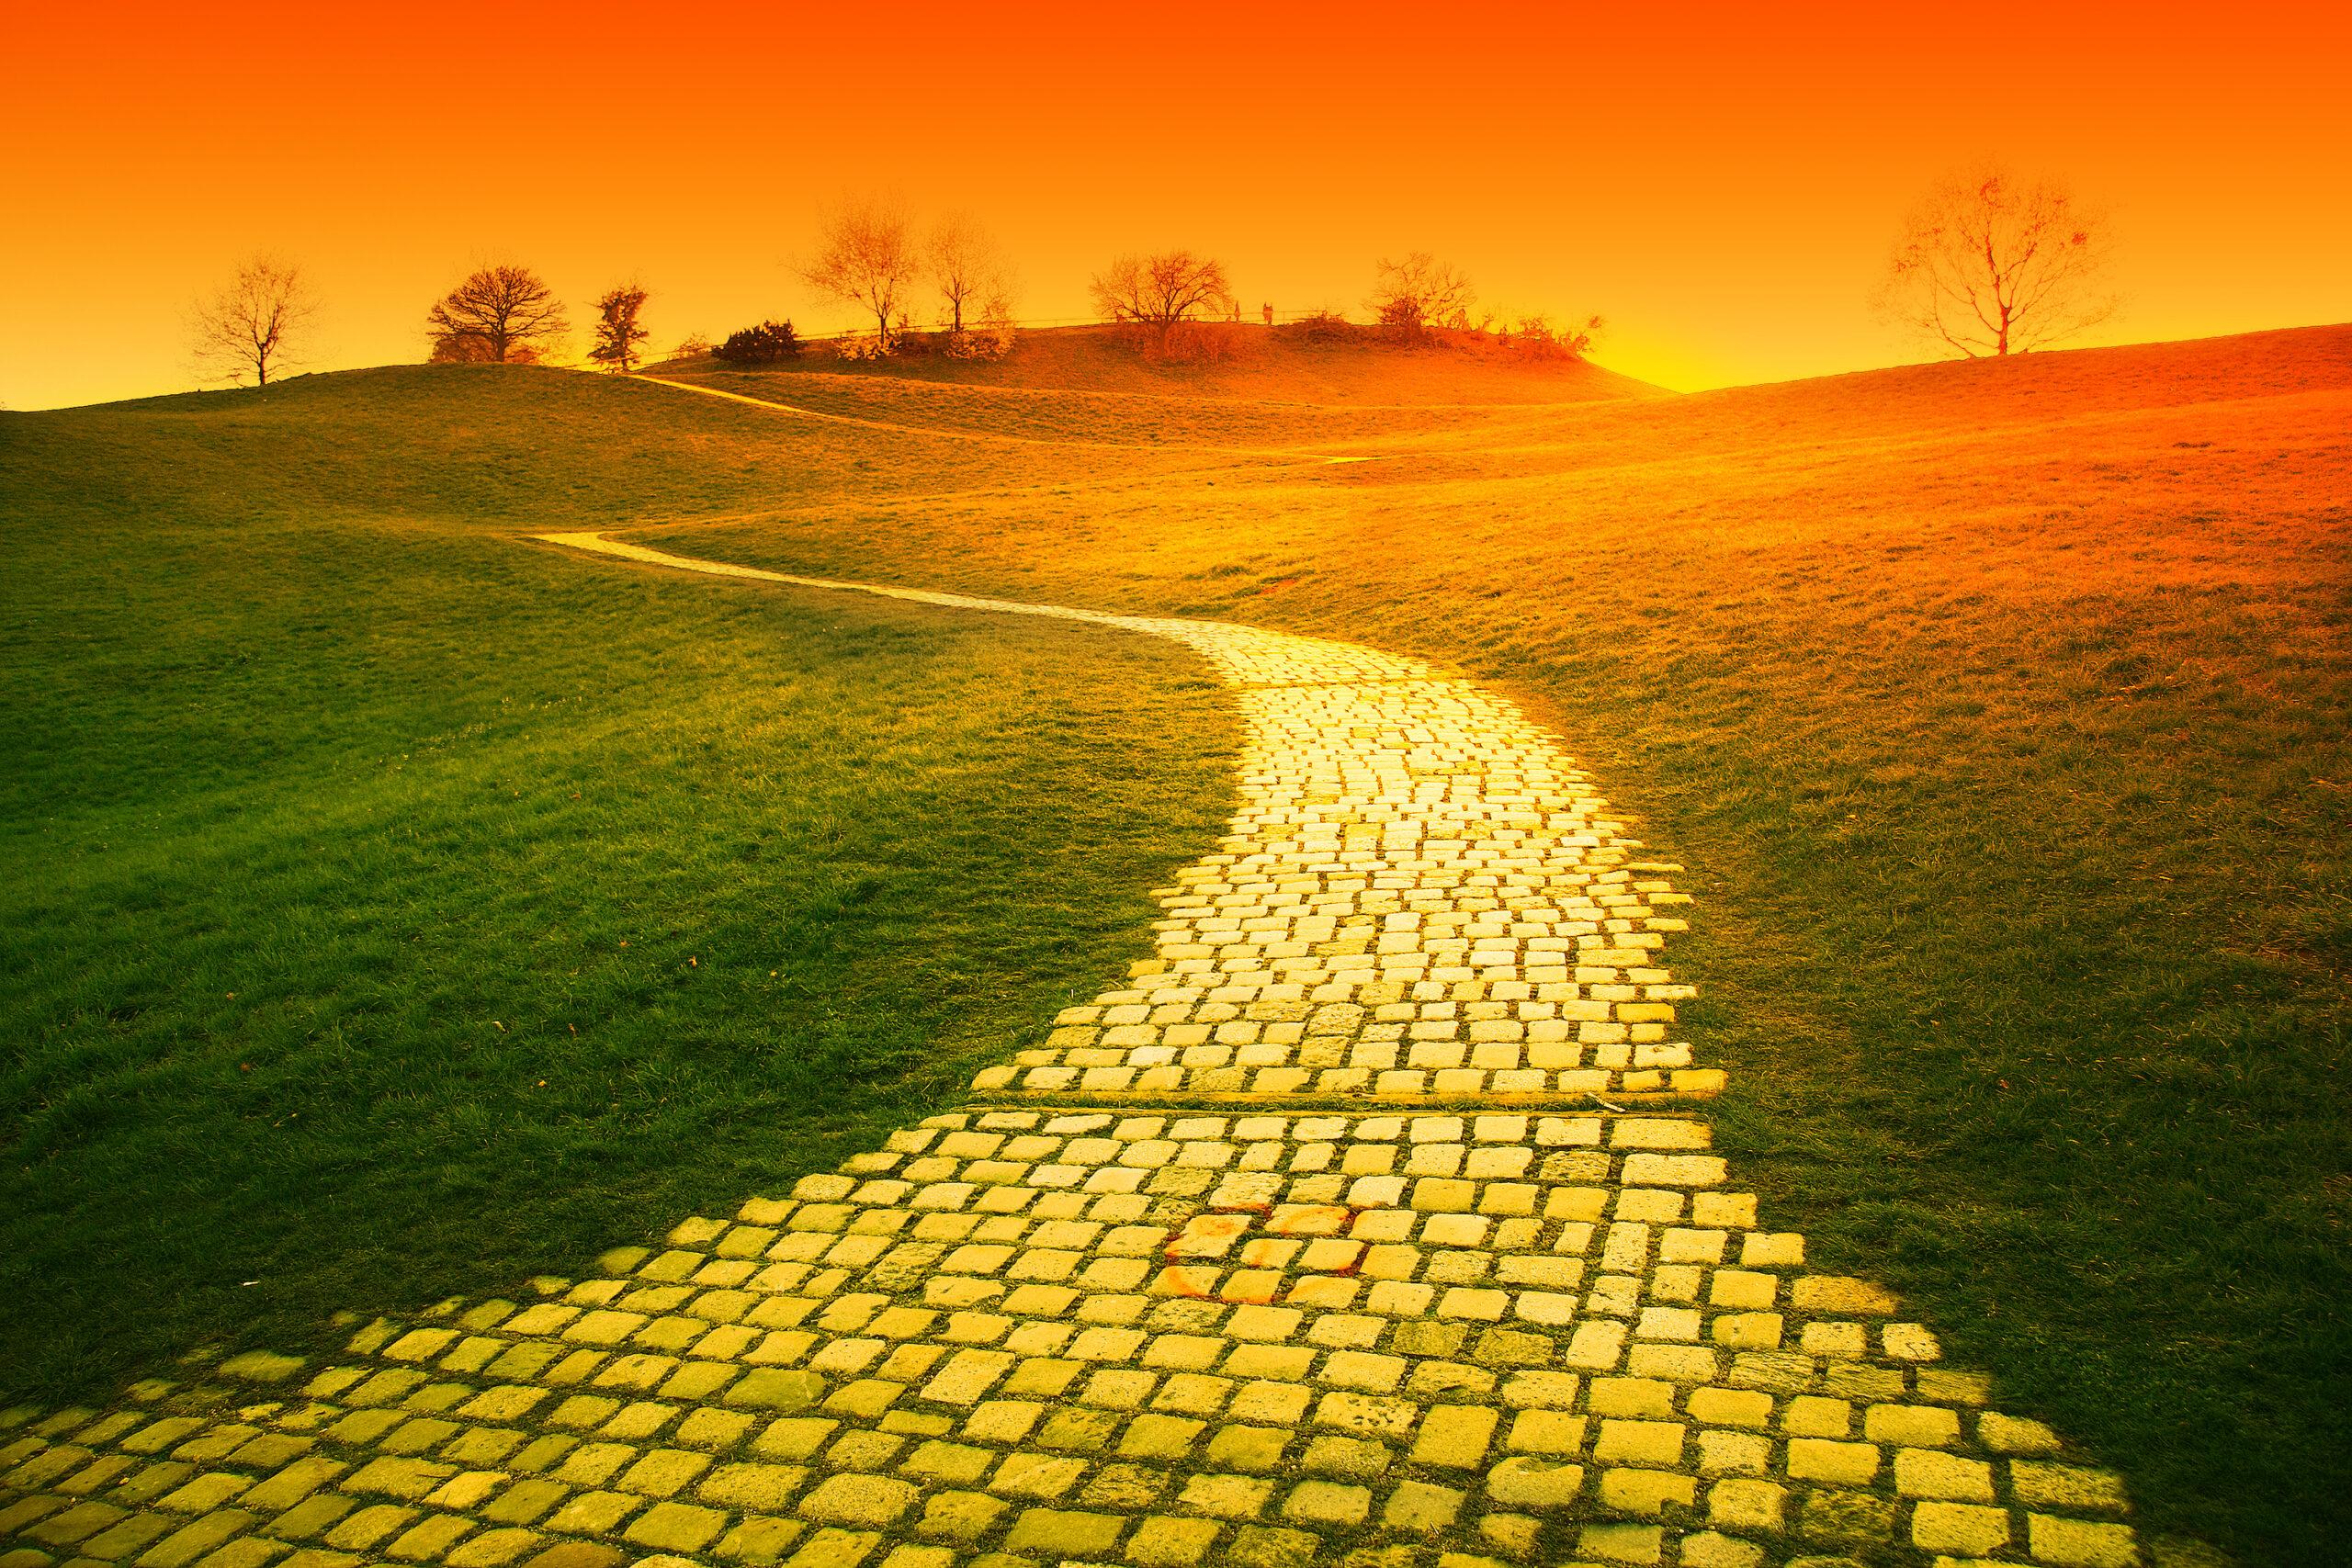 Disruptions on the Yellow Brick Road II